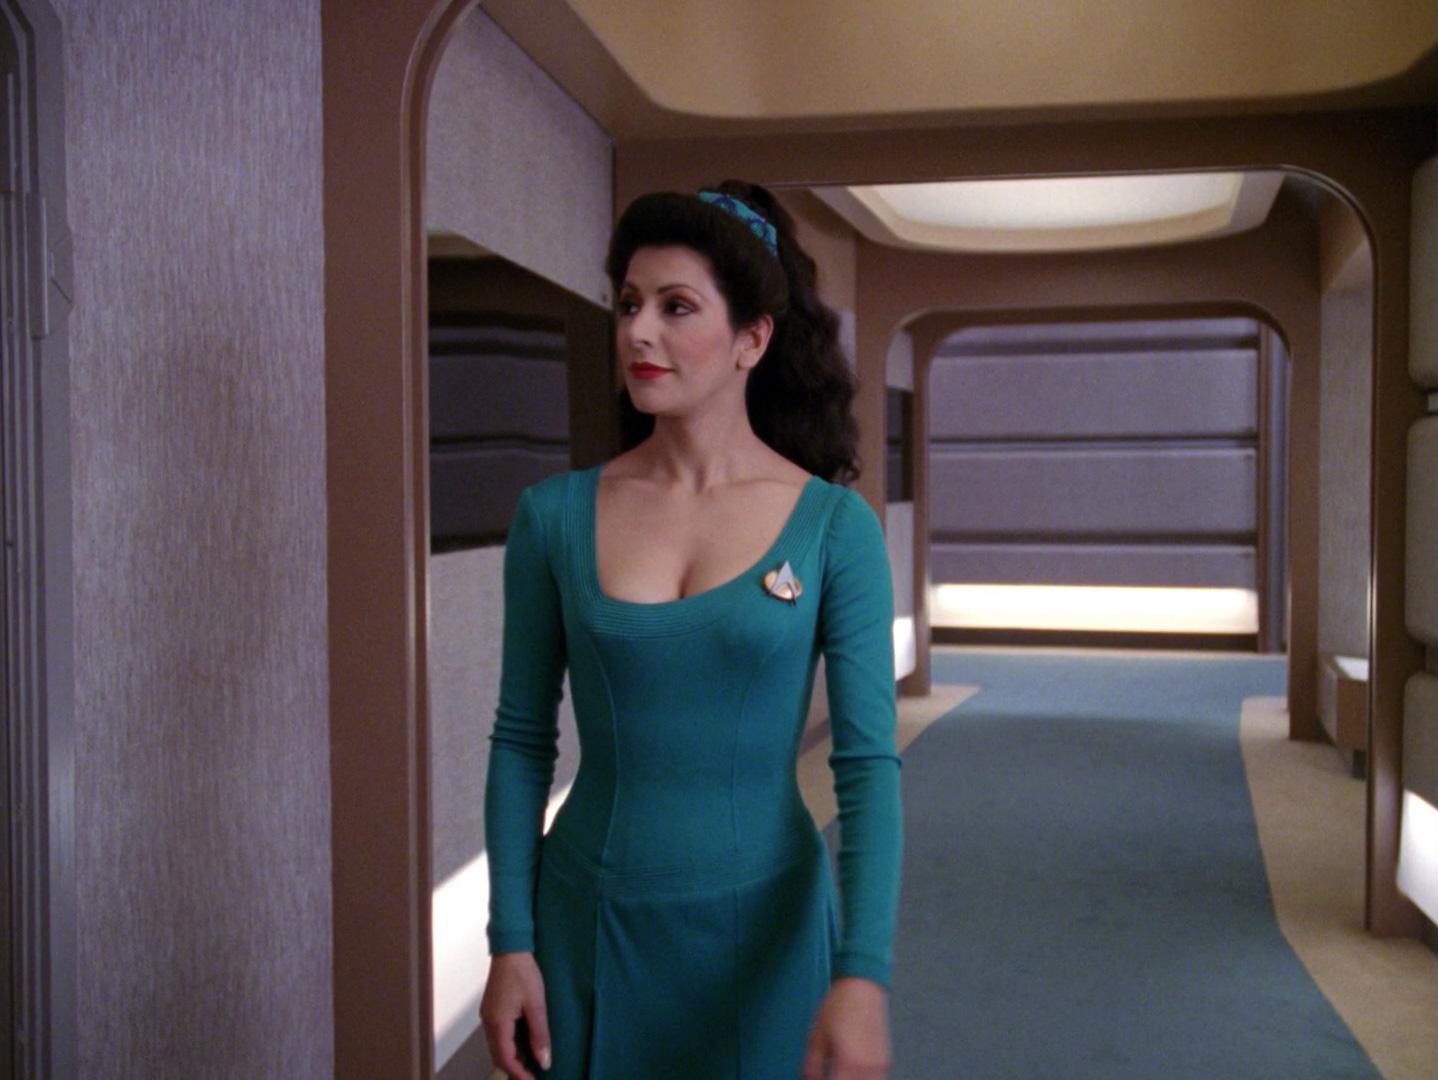 Deanna Troi Cosplay | Peter Csanadi | Flickr |Deanna Troi Green